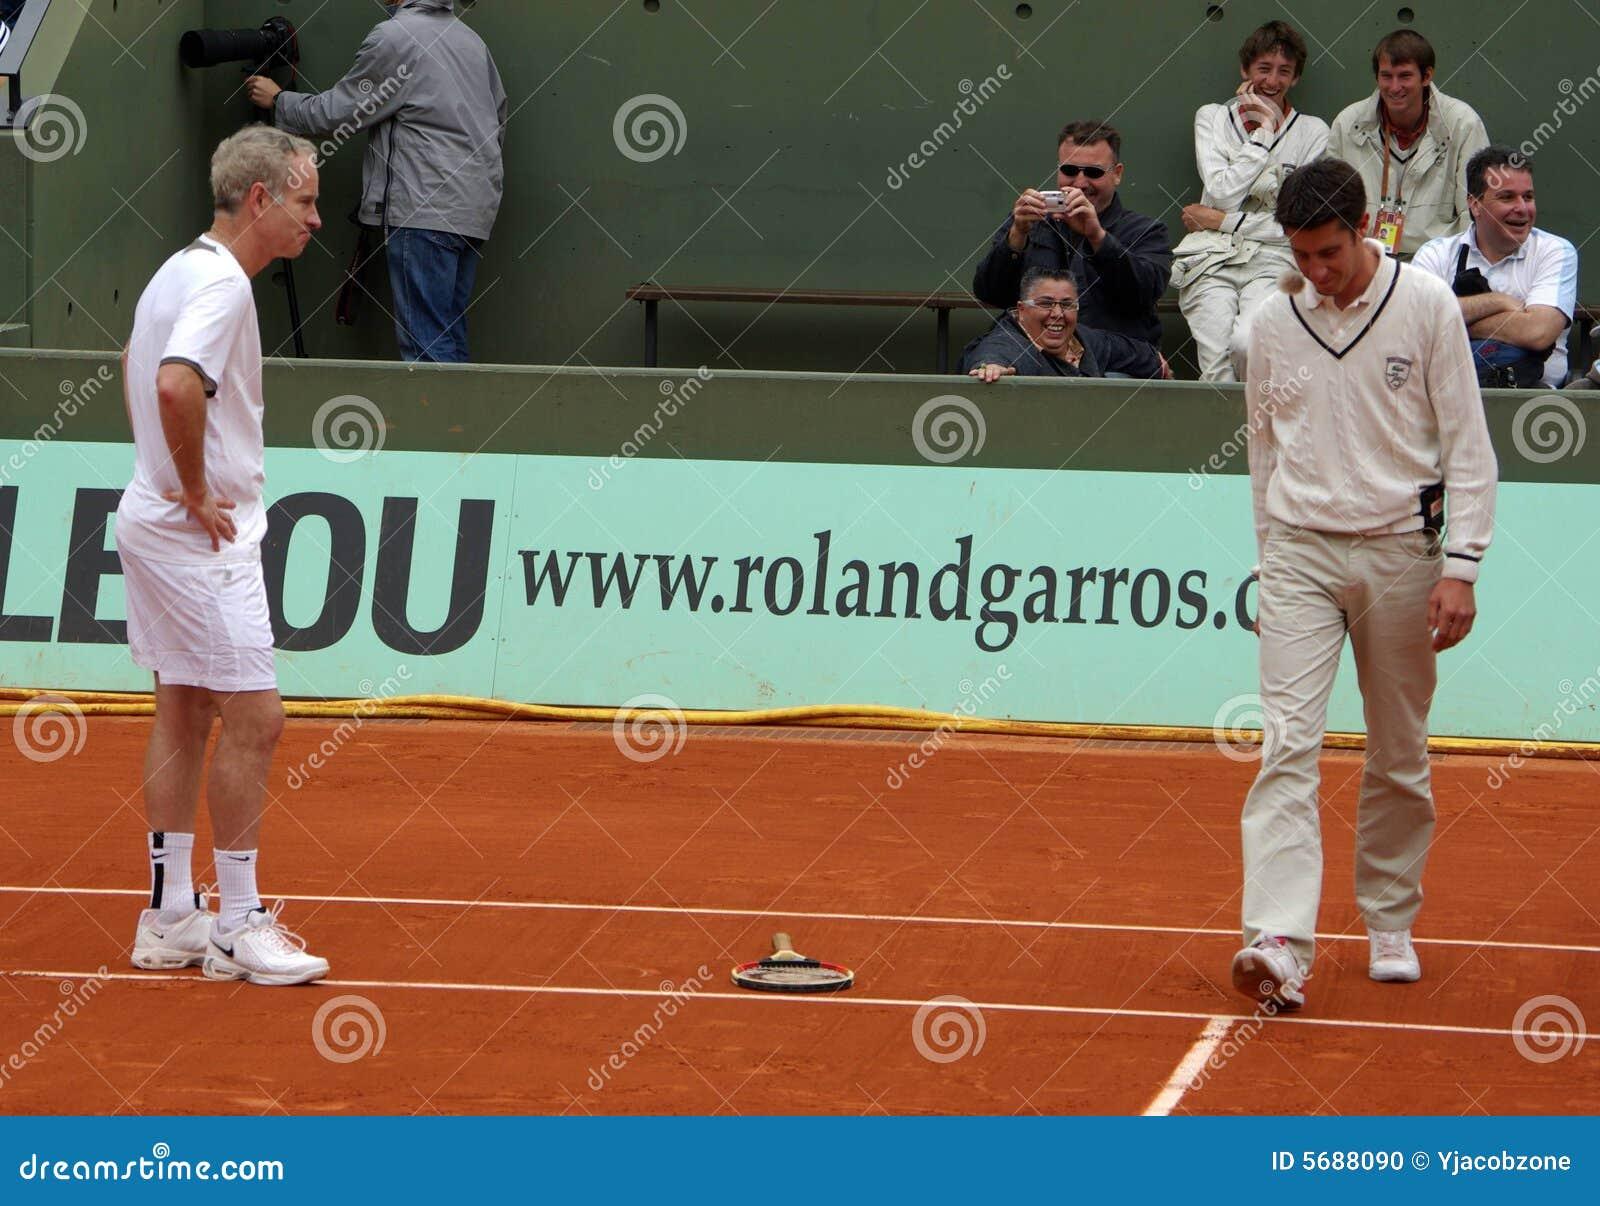 Juan McEnroe